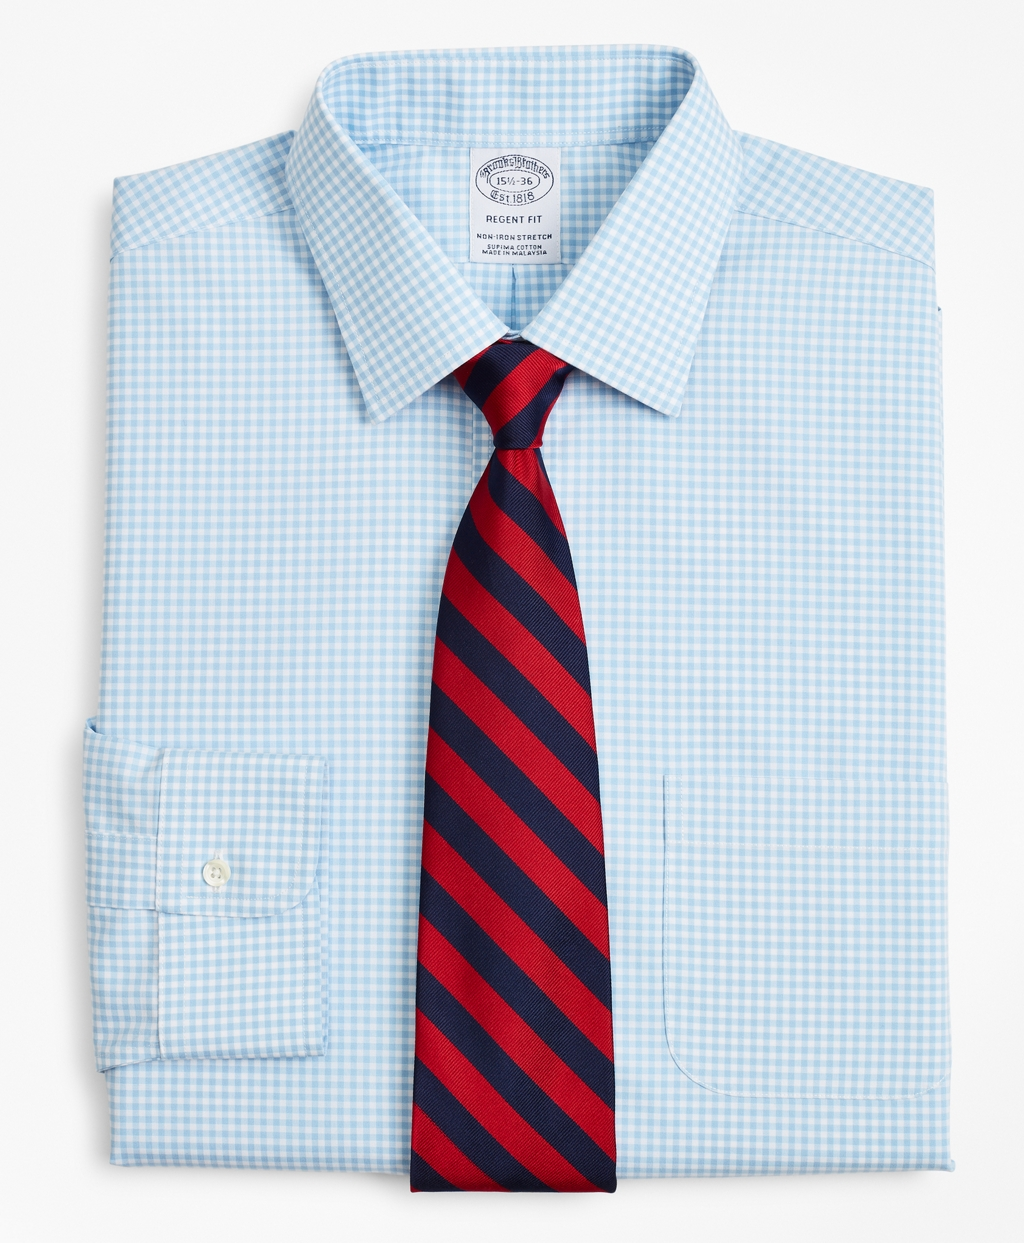 Brooksbrothers Stretch Regent Regular-Fit Dress Shirt, Non-Iron Poplin Ainsley Collar Gingham